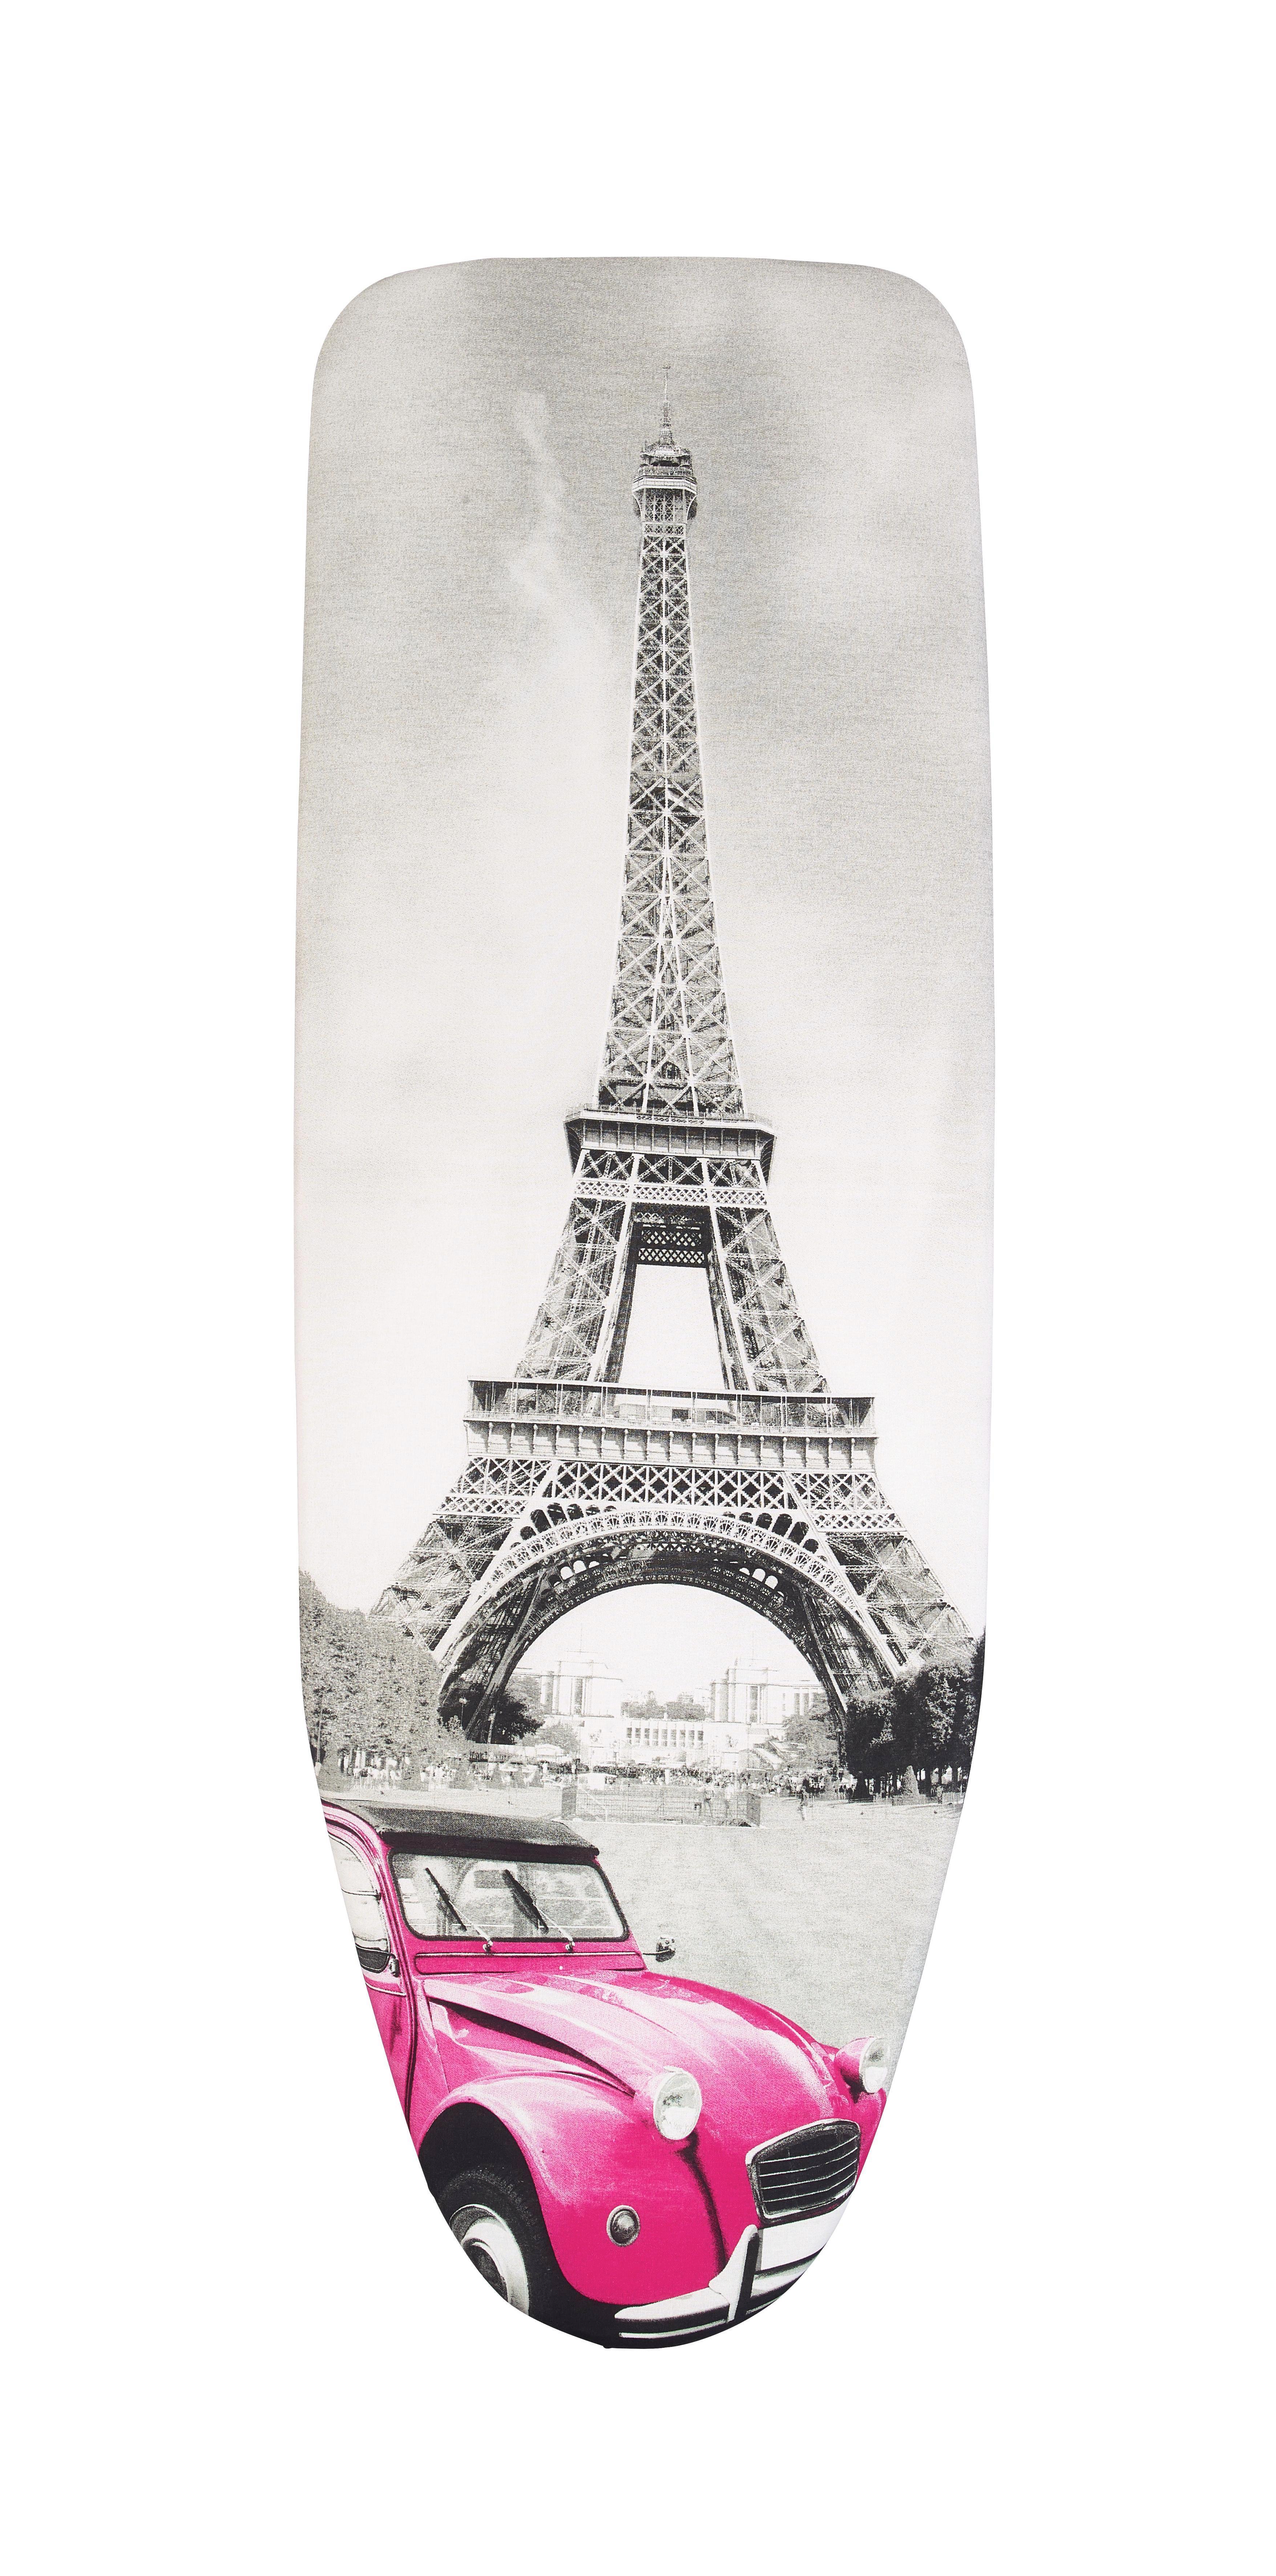 Bügelbrett Gina - Multicolor, Textil (36/114cm) - MÖMAX modern living